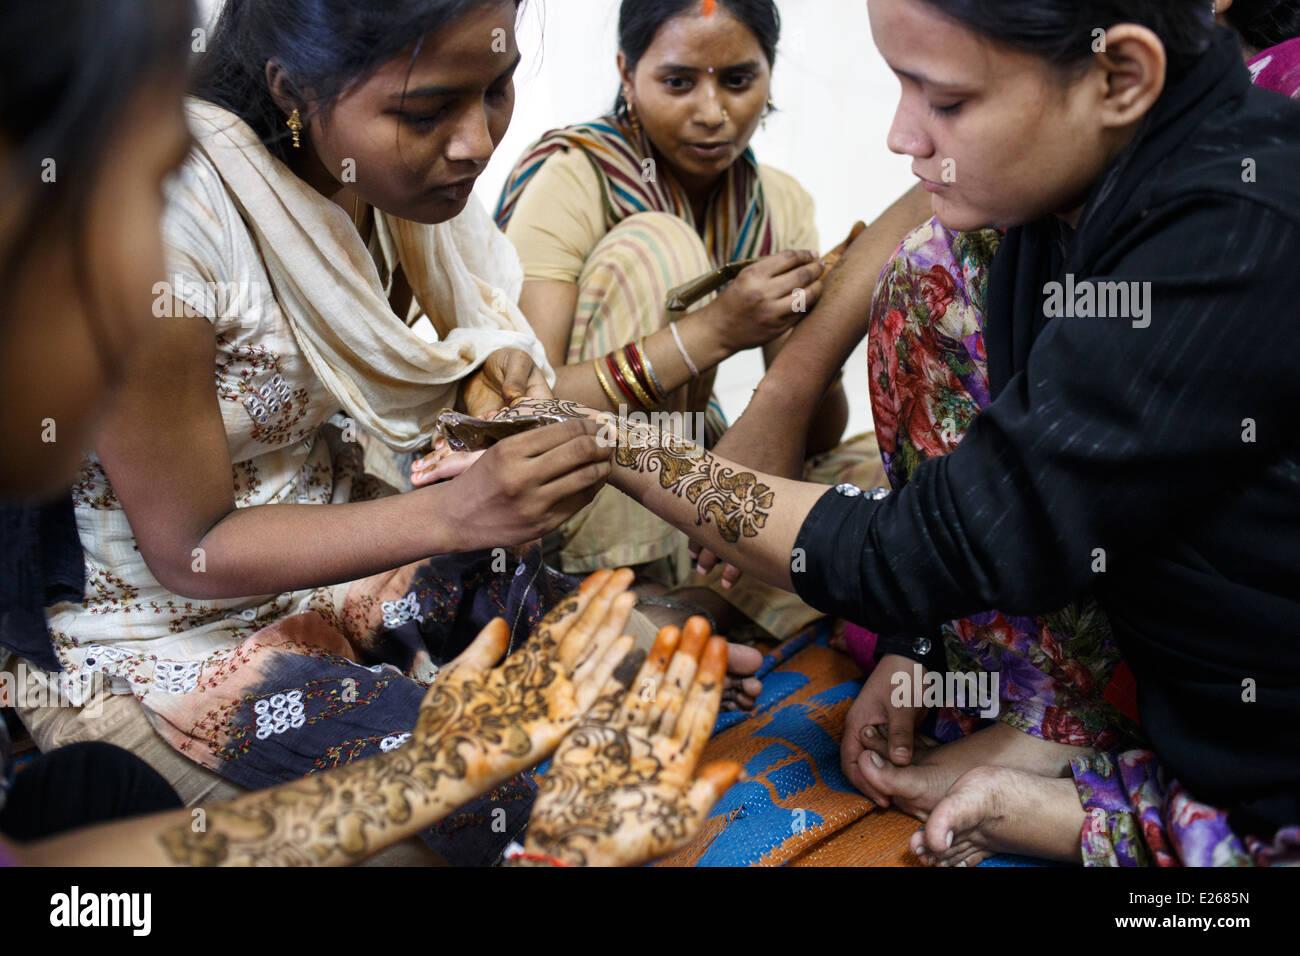 A mehndi (heena, henna) art class run by a local NGO in Kandivali area of Mumbai, India. - Stock Image